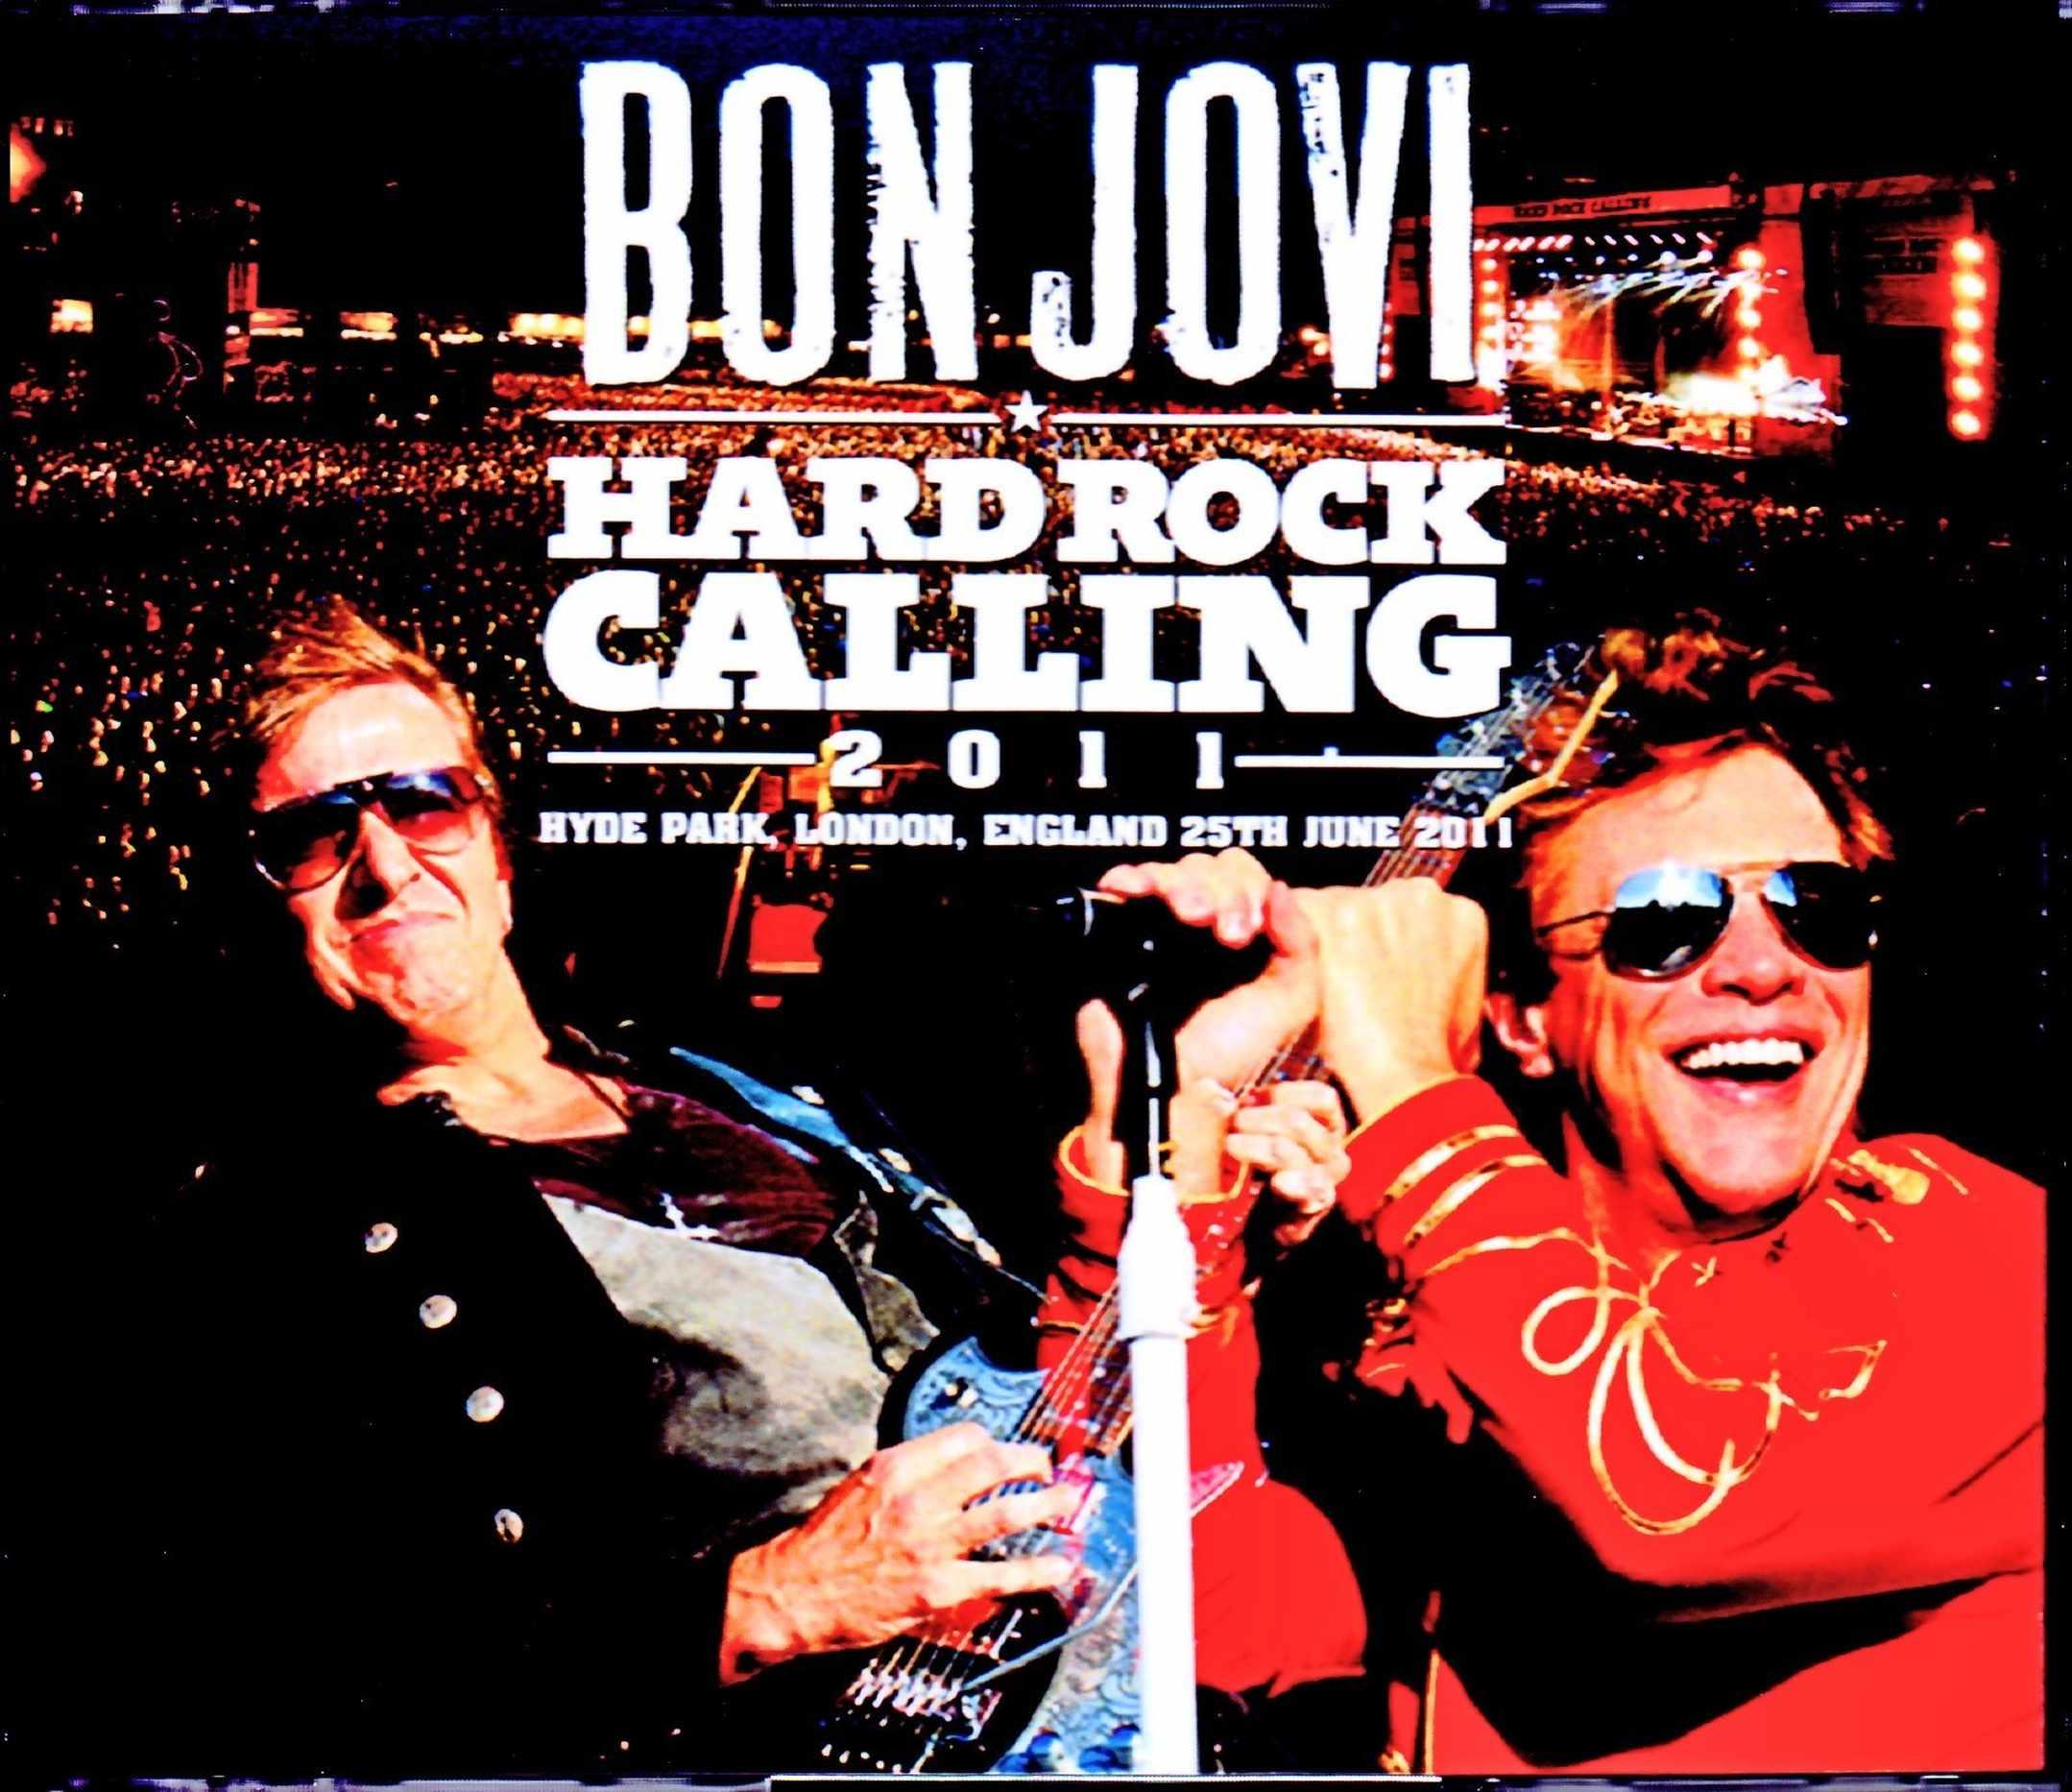 Bon Jovi ボン・ジョヴィ/London,UK 2011 Complete S & V